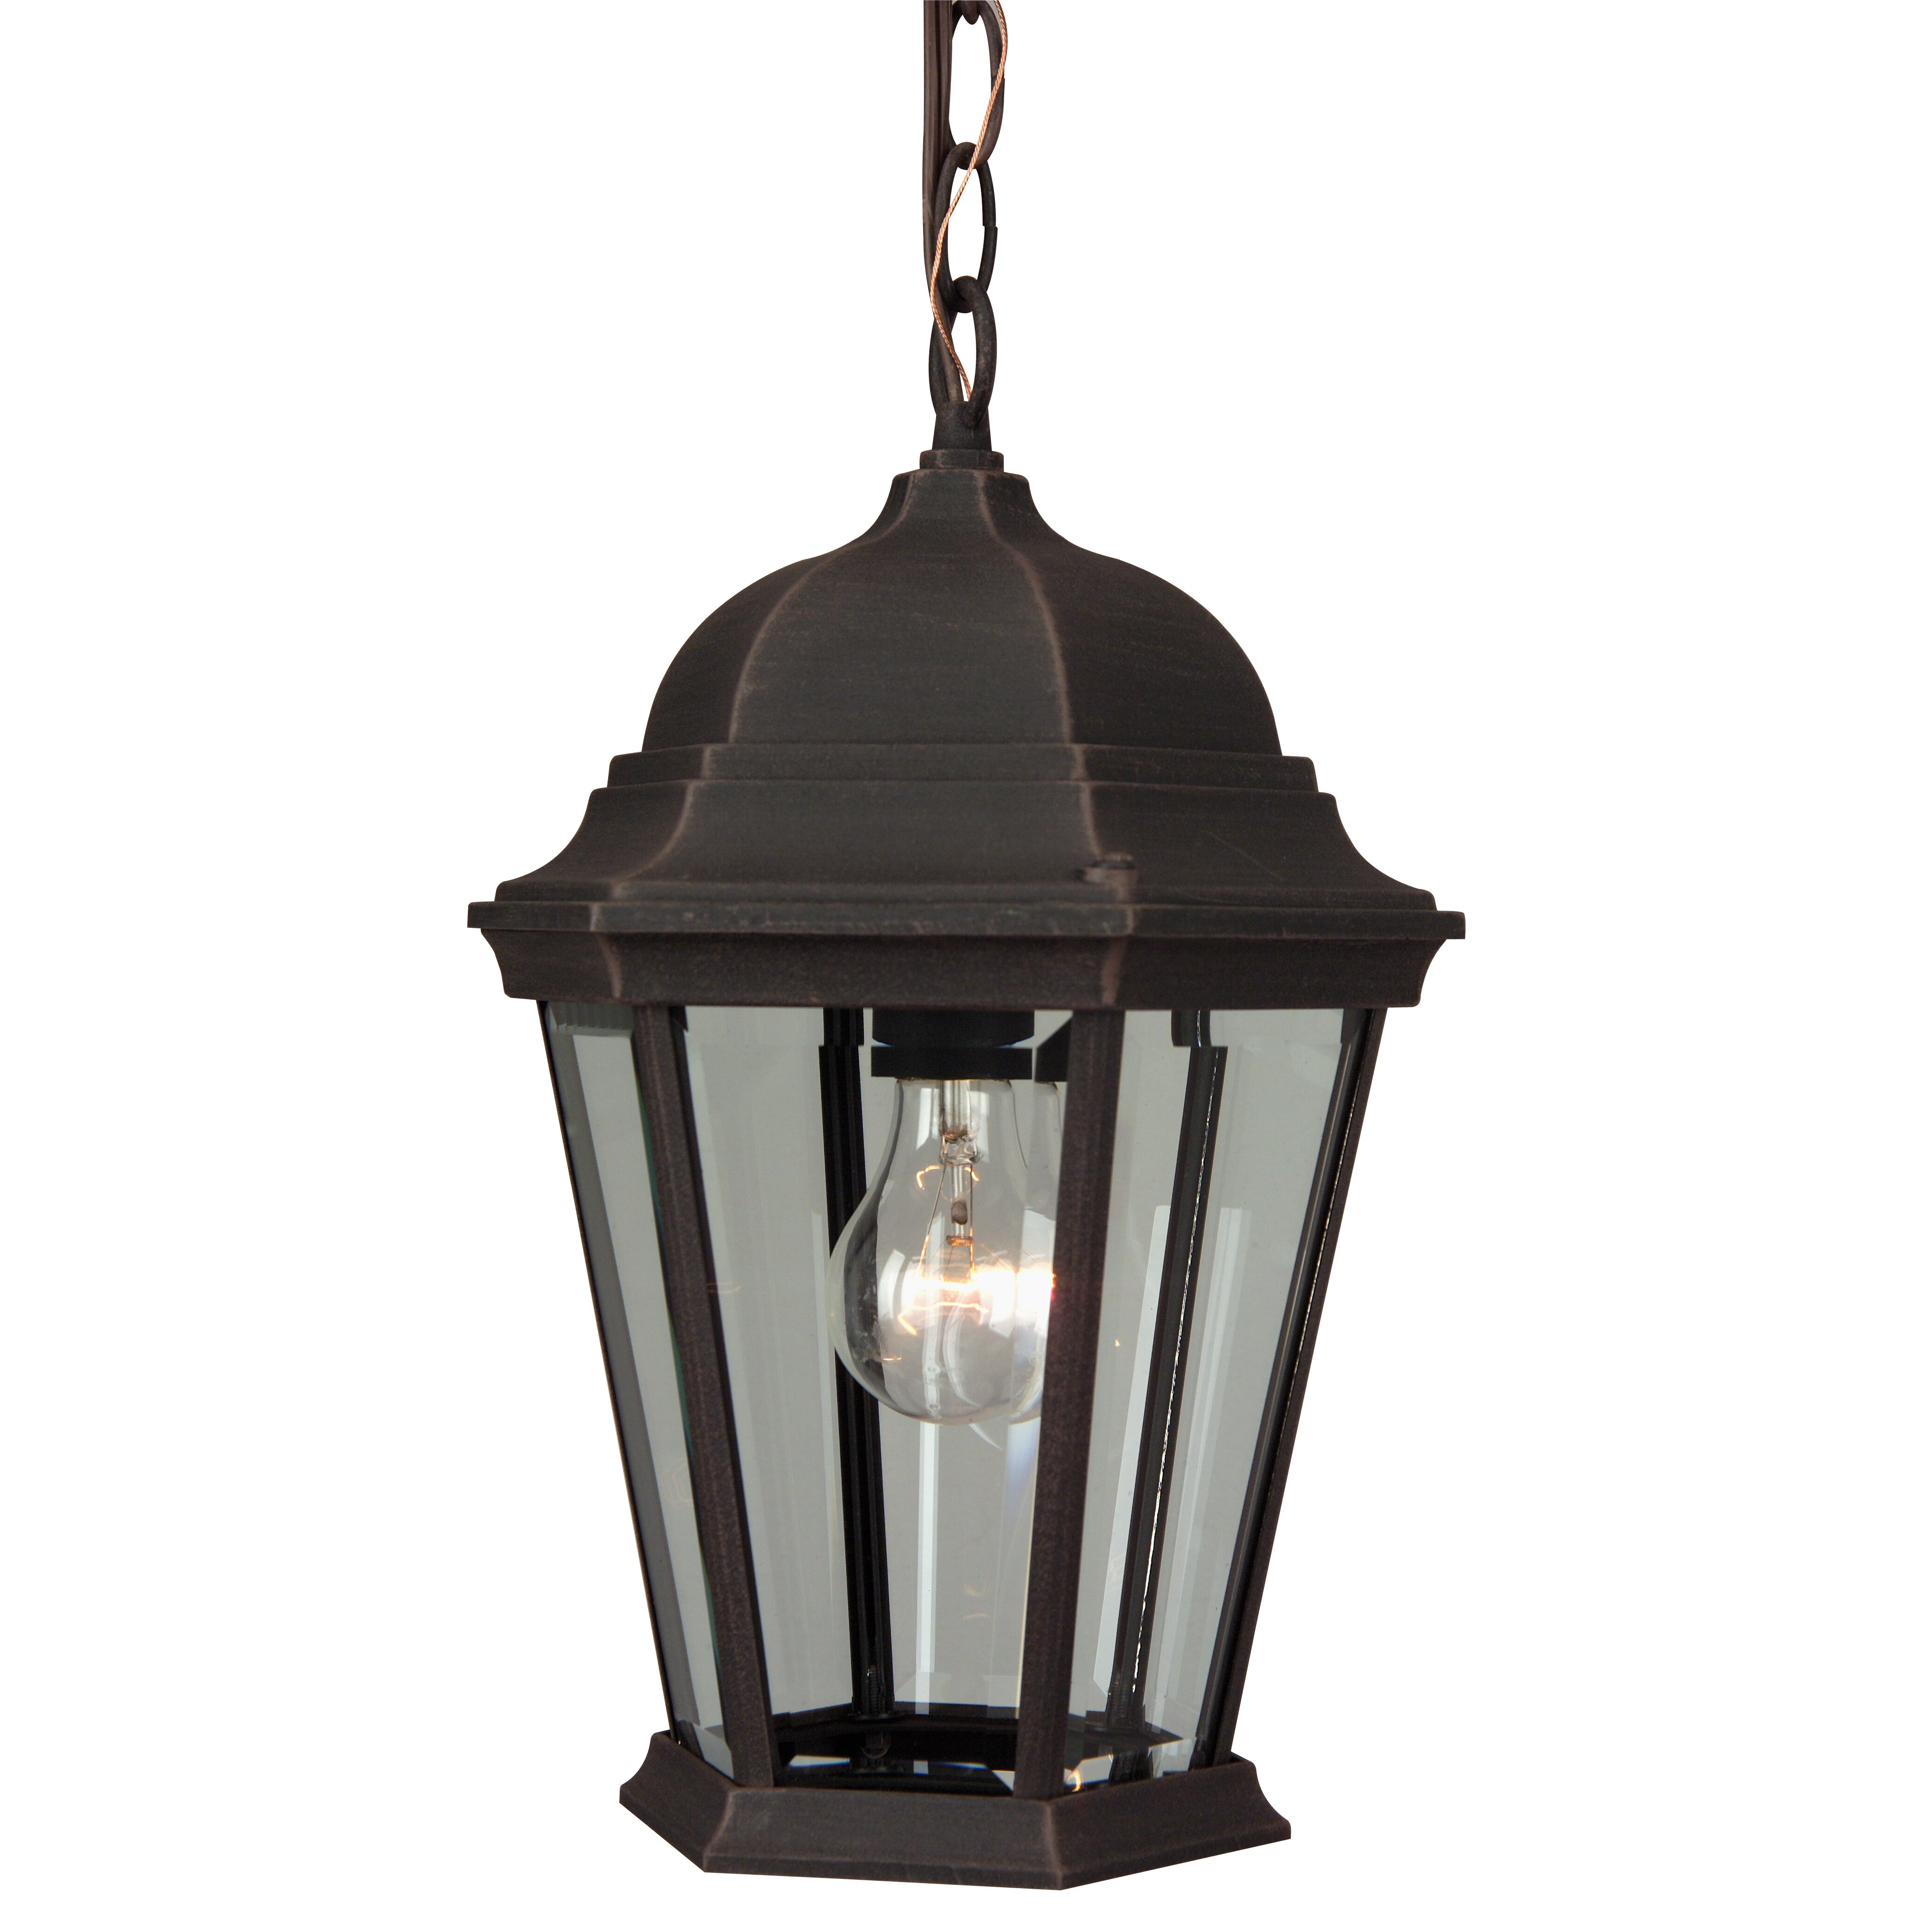 Wayfair Outdoor Hanging Lights: Craftmade 1 Light Outdoor Hanging Lantern & Reviews